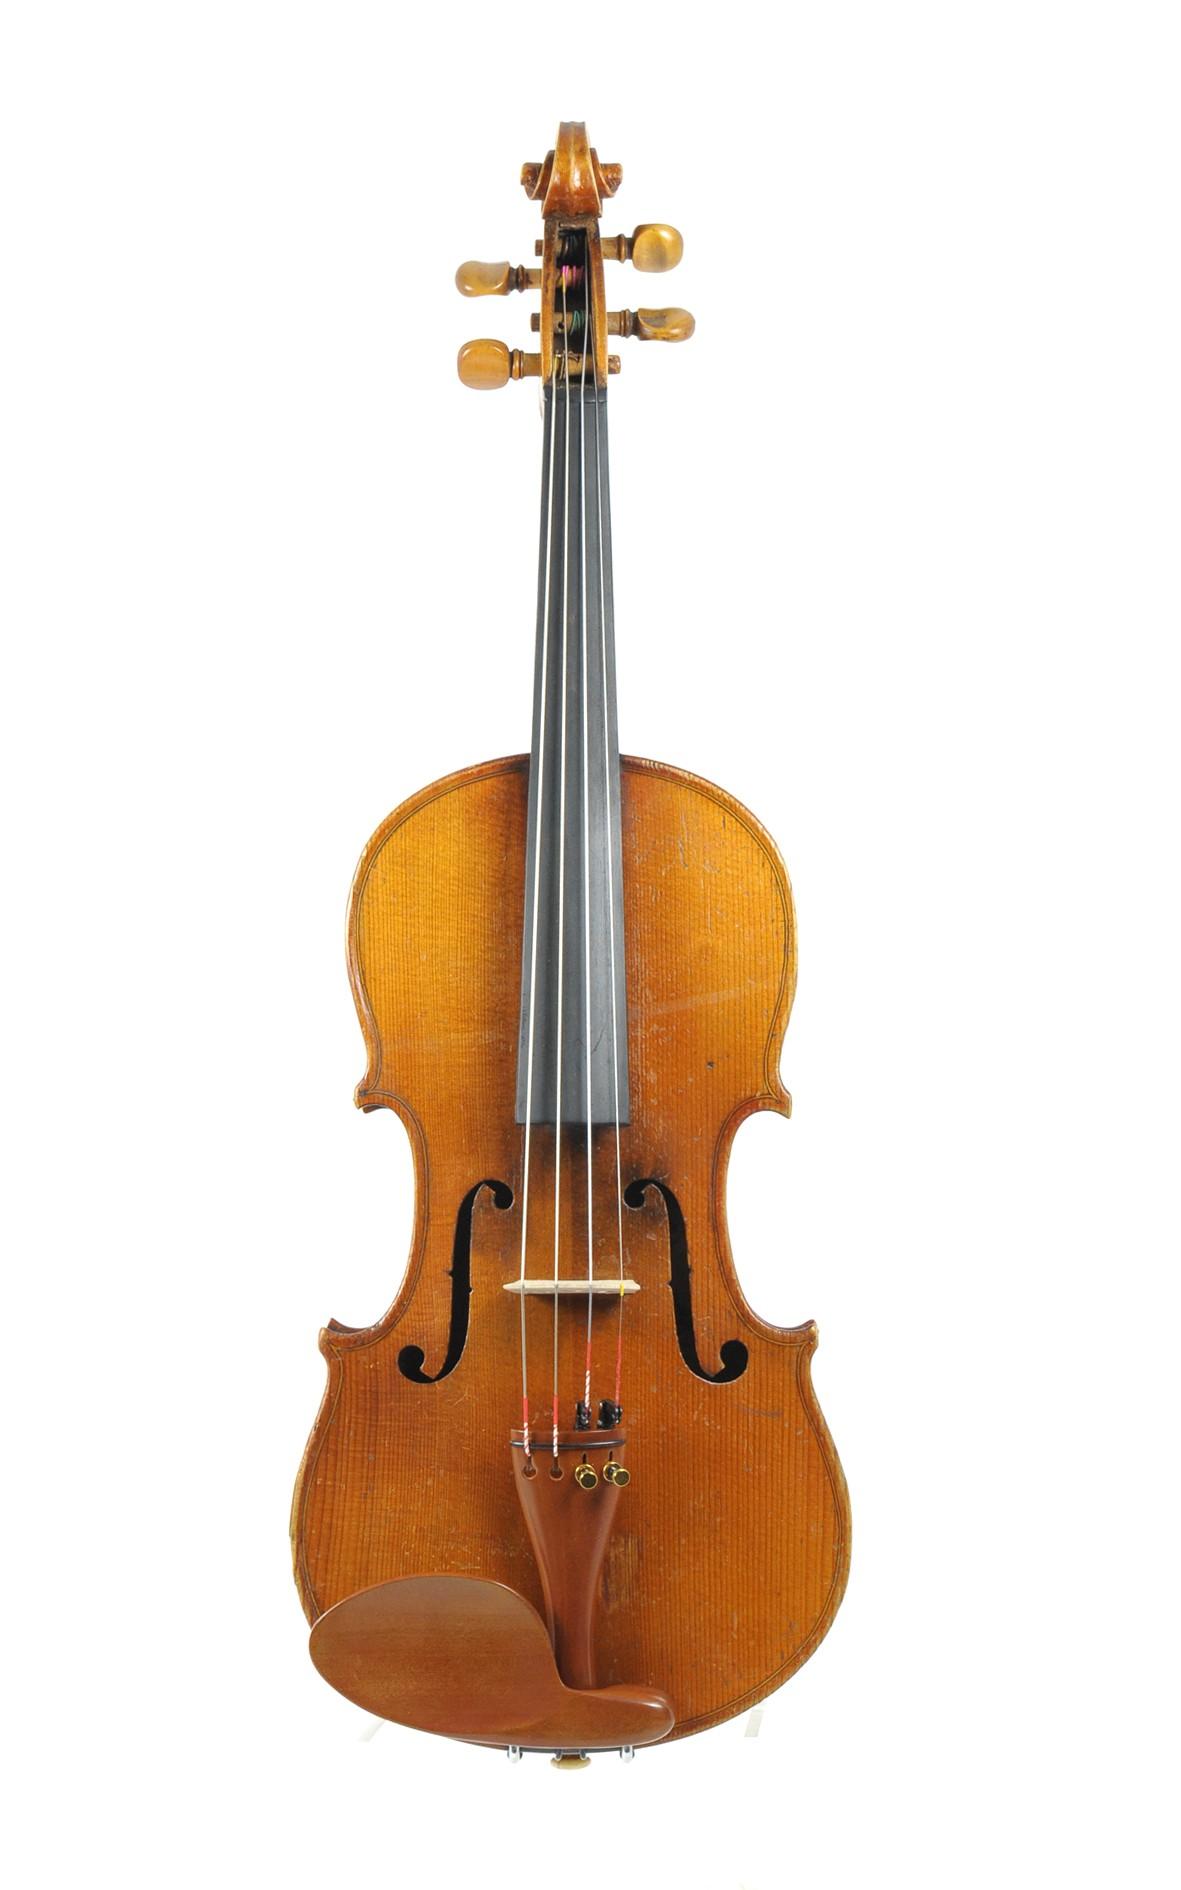 3/4 sized antique violin, presum. England - top